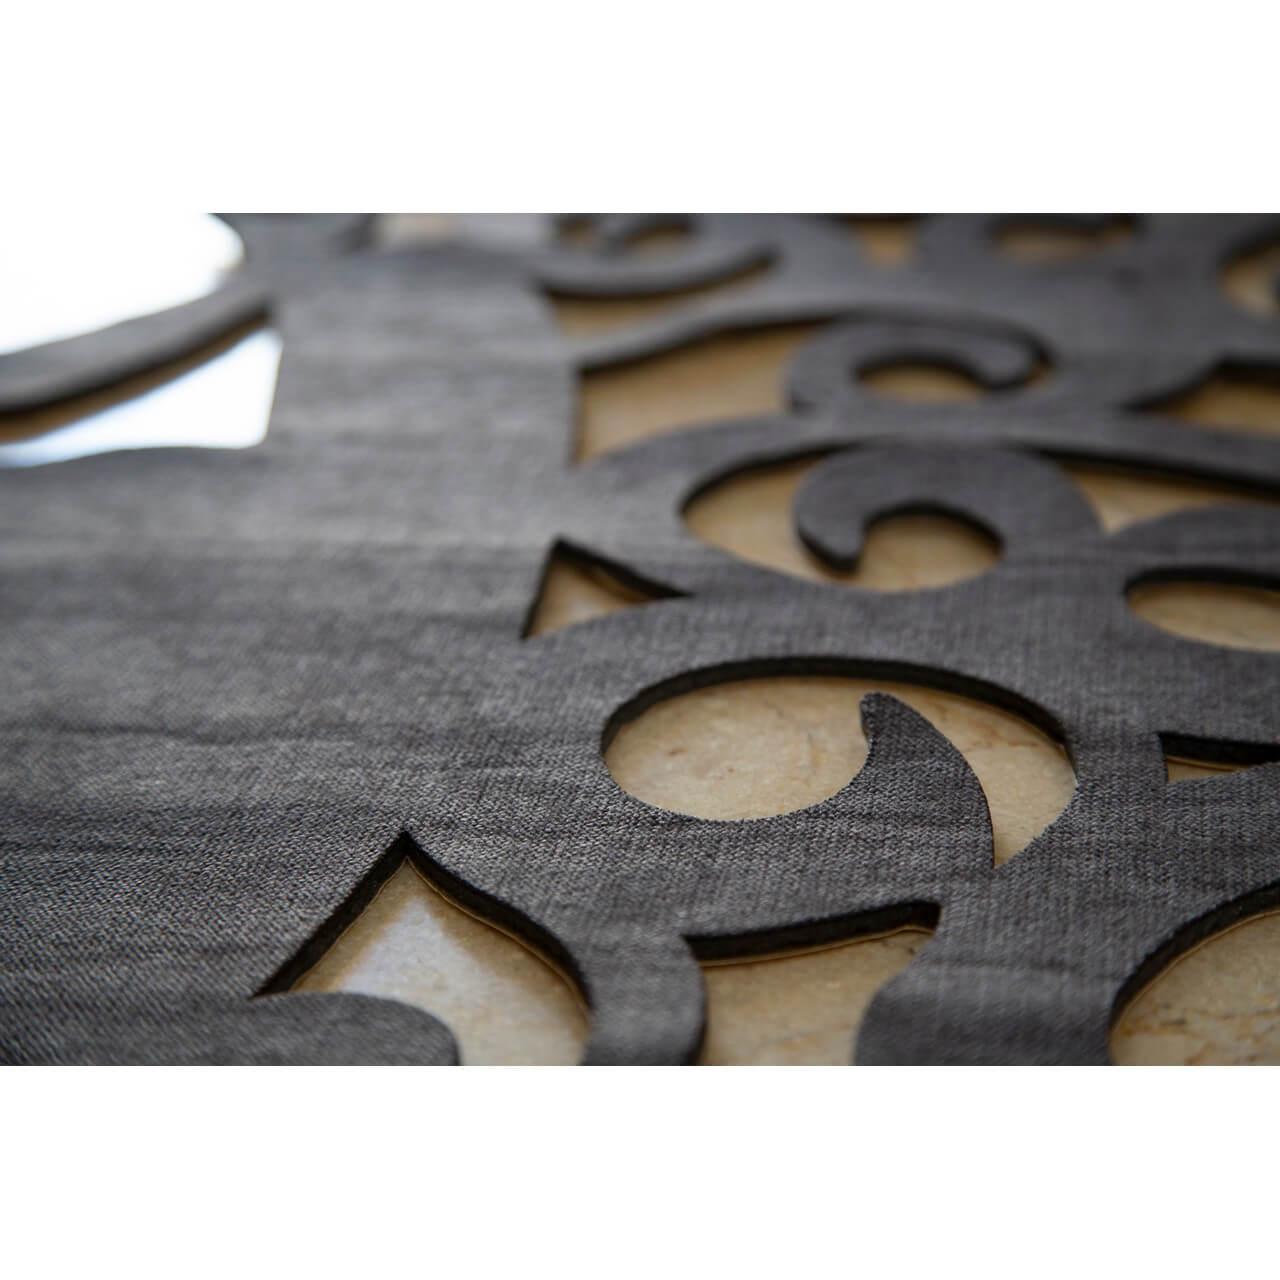 Proveedores de componentes o servicios para decoración